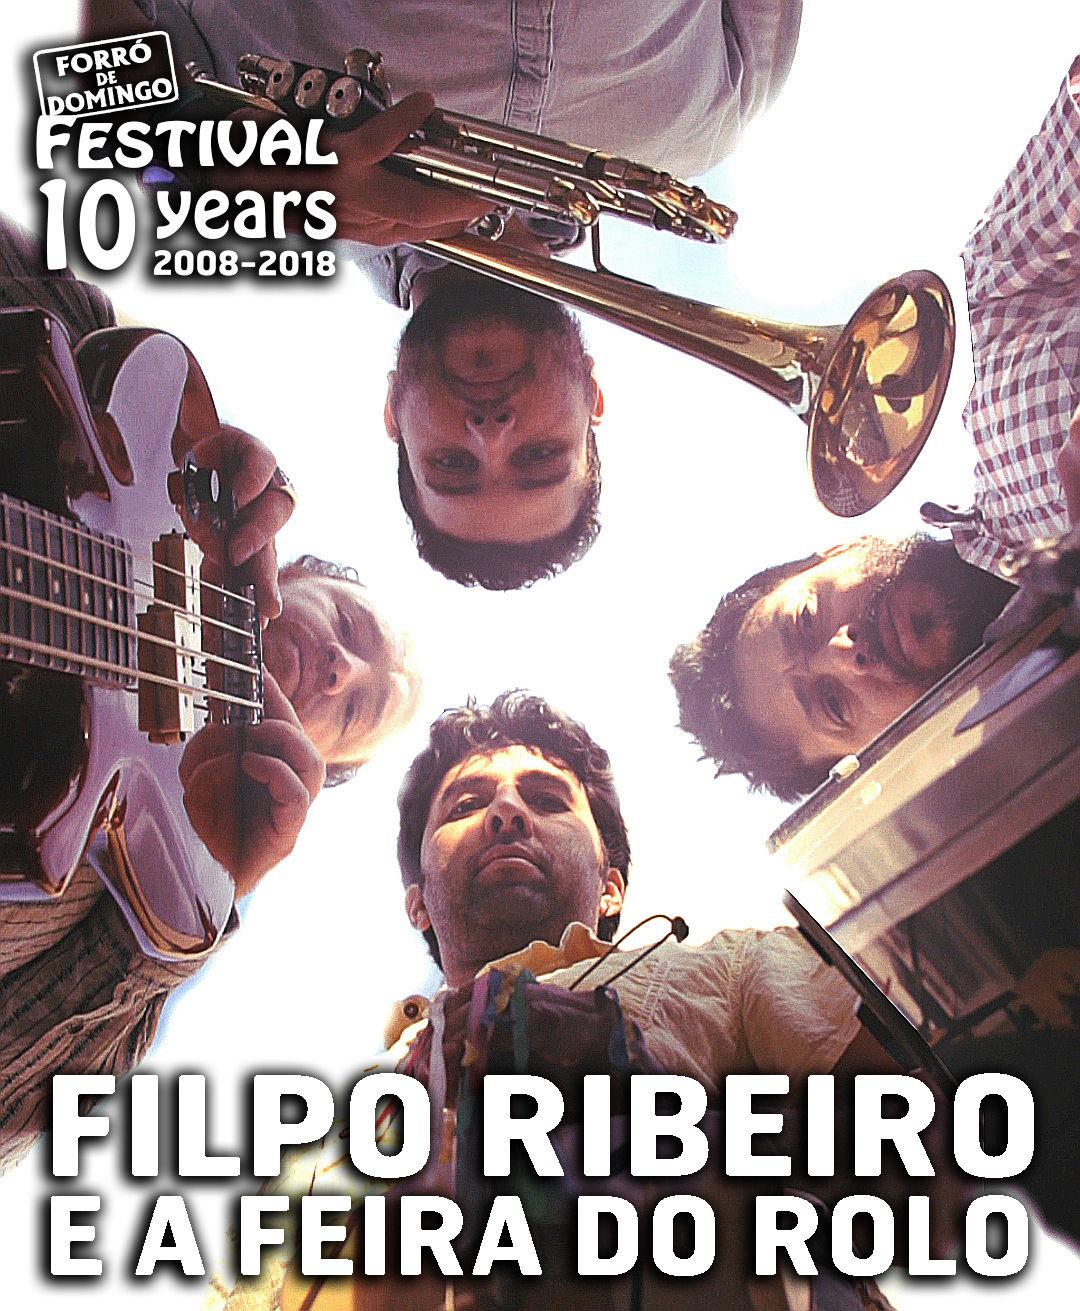 http://forrofestival.com/wp-content/uploads/2018/03/FILPO-E-A-BANDA_forro-de-domingo-festival-2018_1.jpg